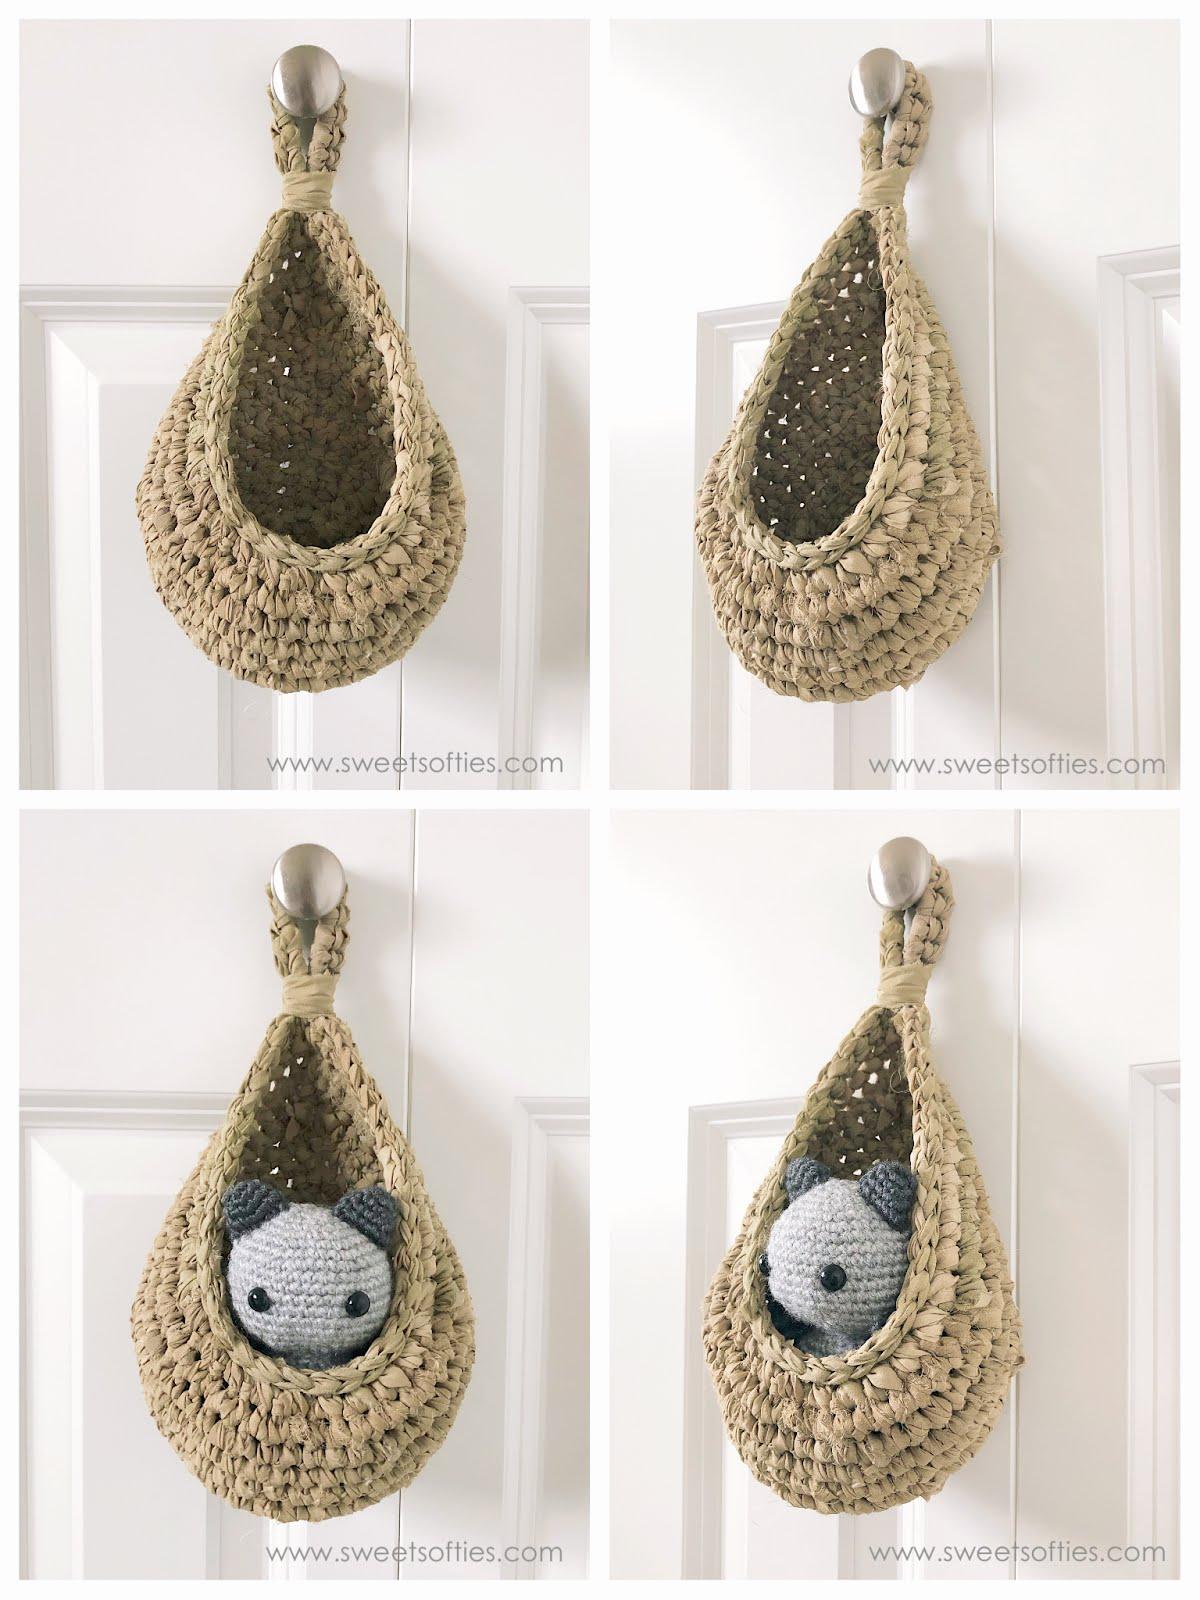 46 Free & Amazing Crochet Baskets For Storage (med bilder) | Hekle ... | 1600x1200